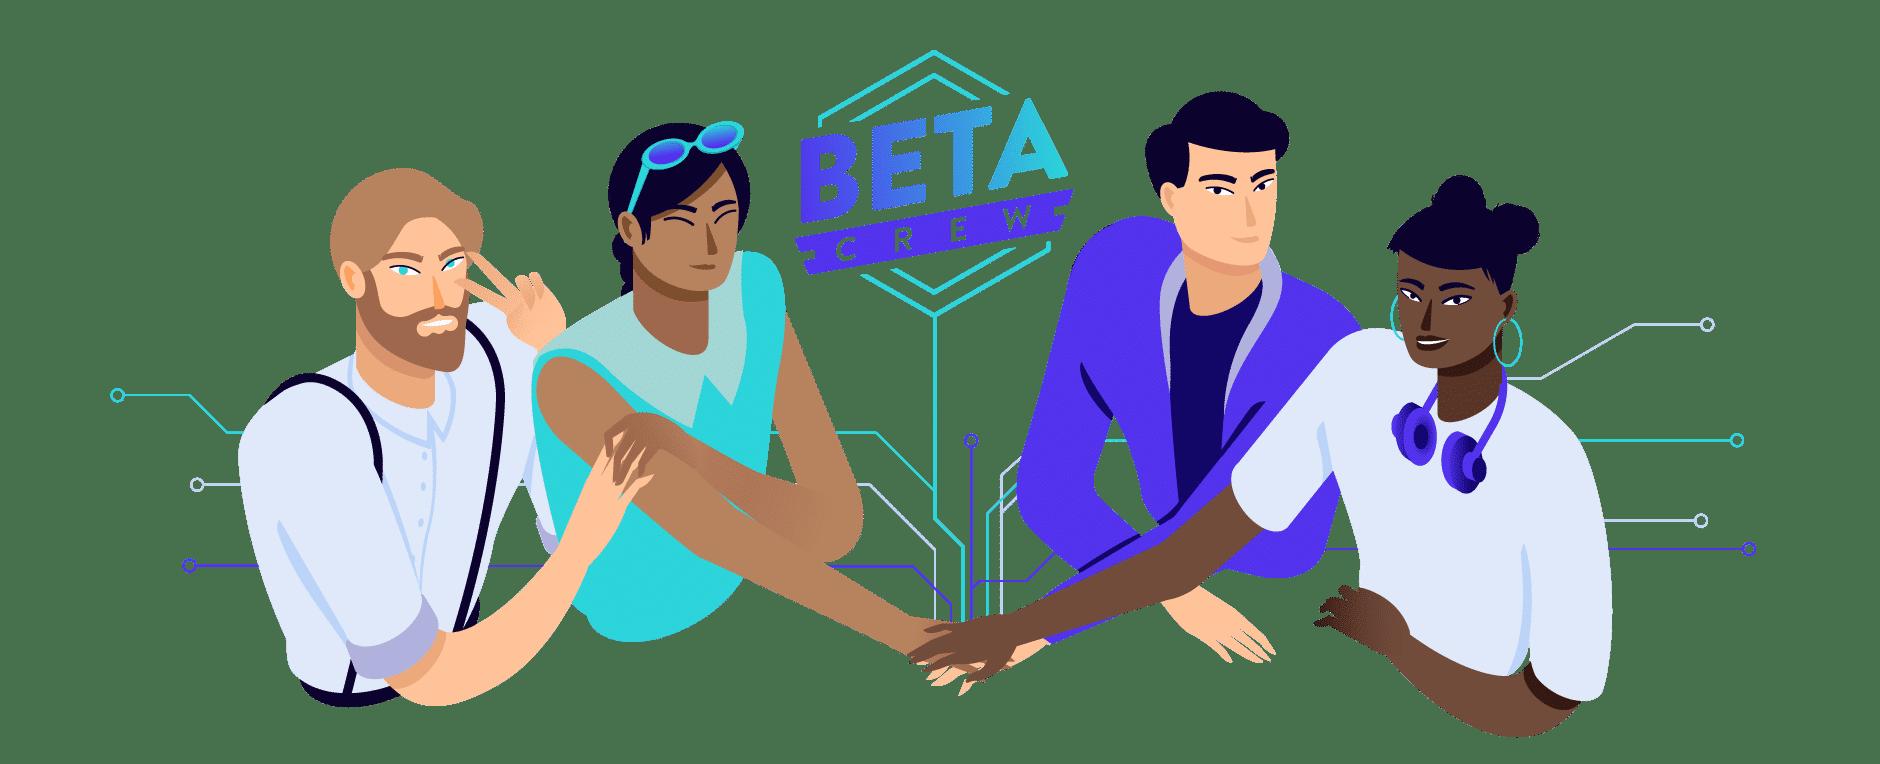 Kinsta Beta Crew